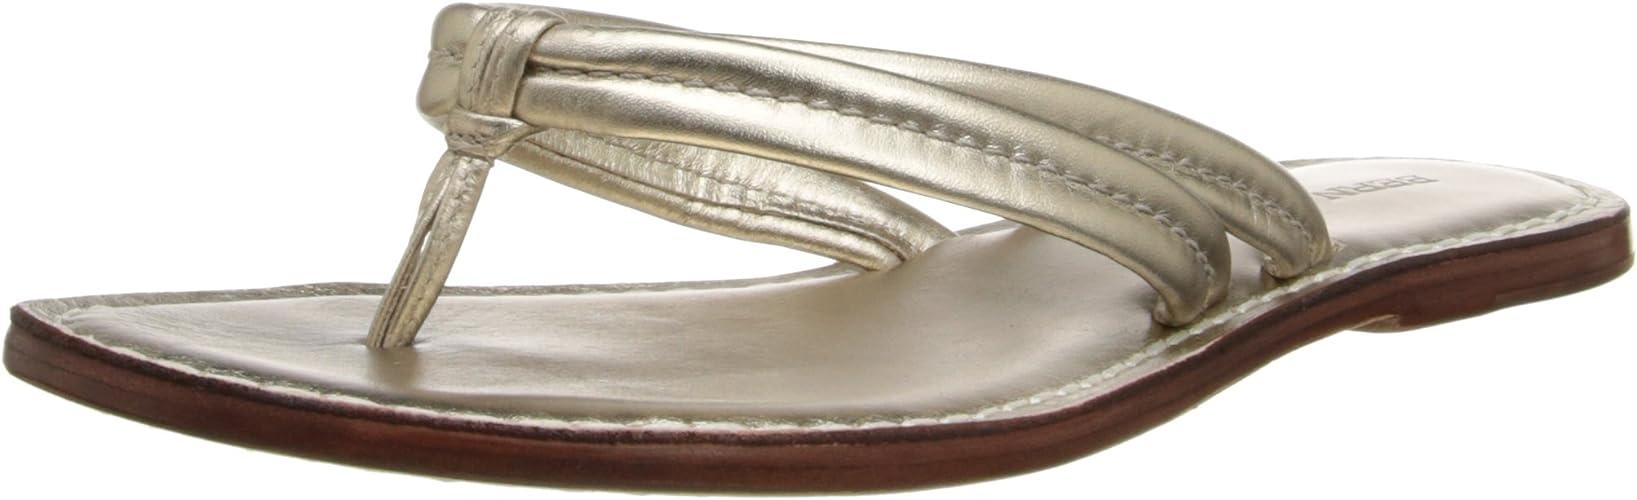 Bernardo Wohommes Miami Dress Sandal, Platinum Calf,8.5 M US